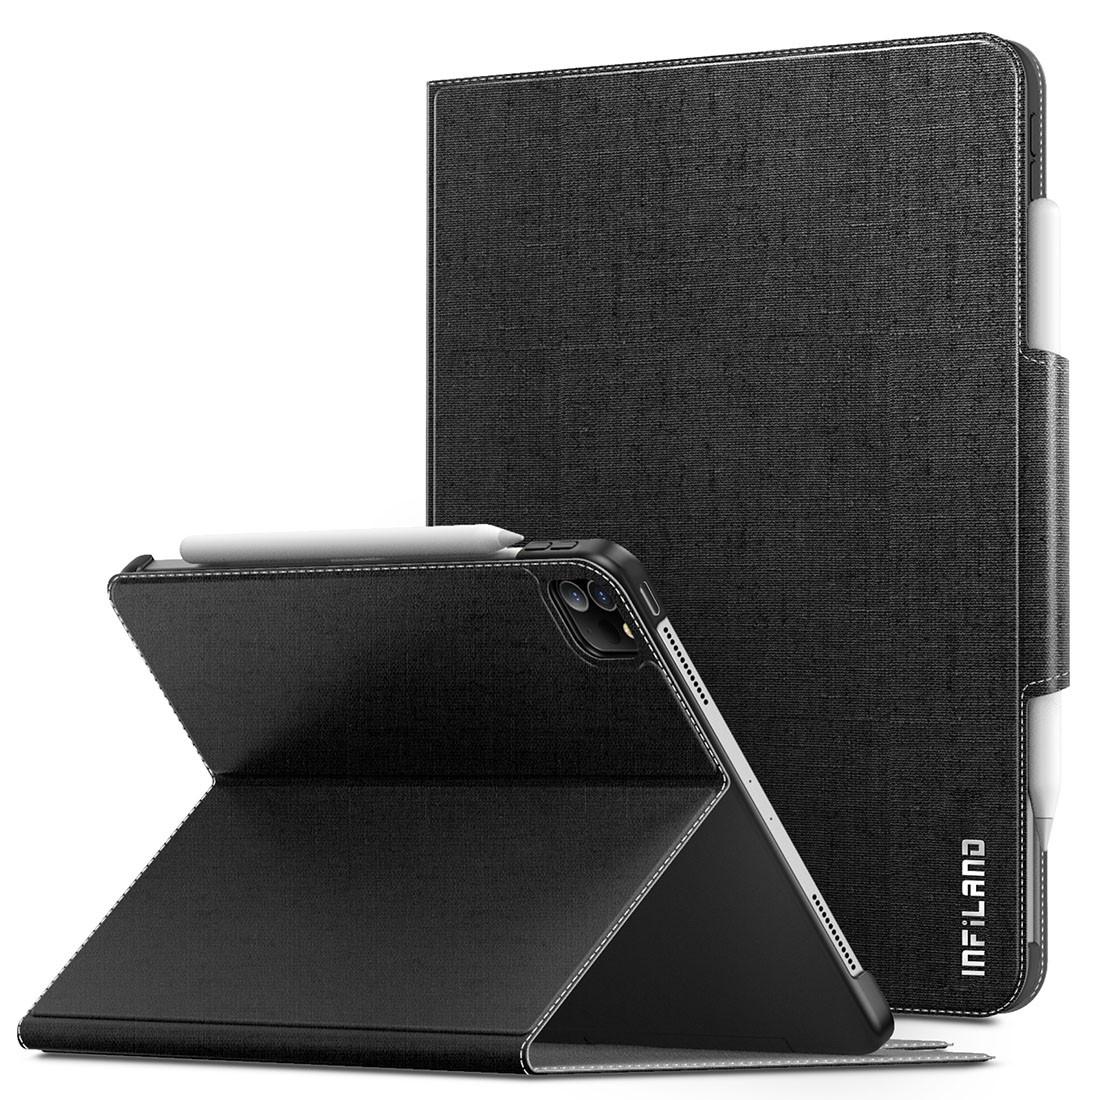 Capa Premium Classic Series Fino Acabamento iPad Pro 2018 11 pol A1980 A1934